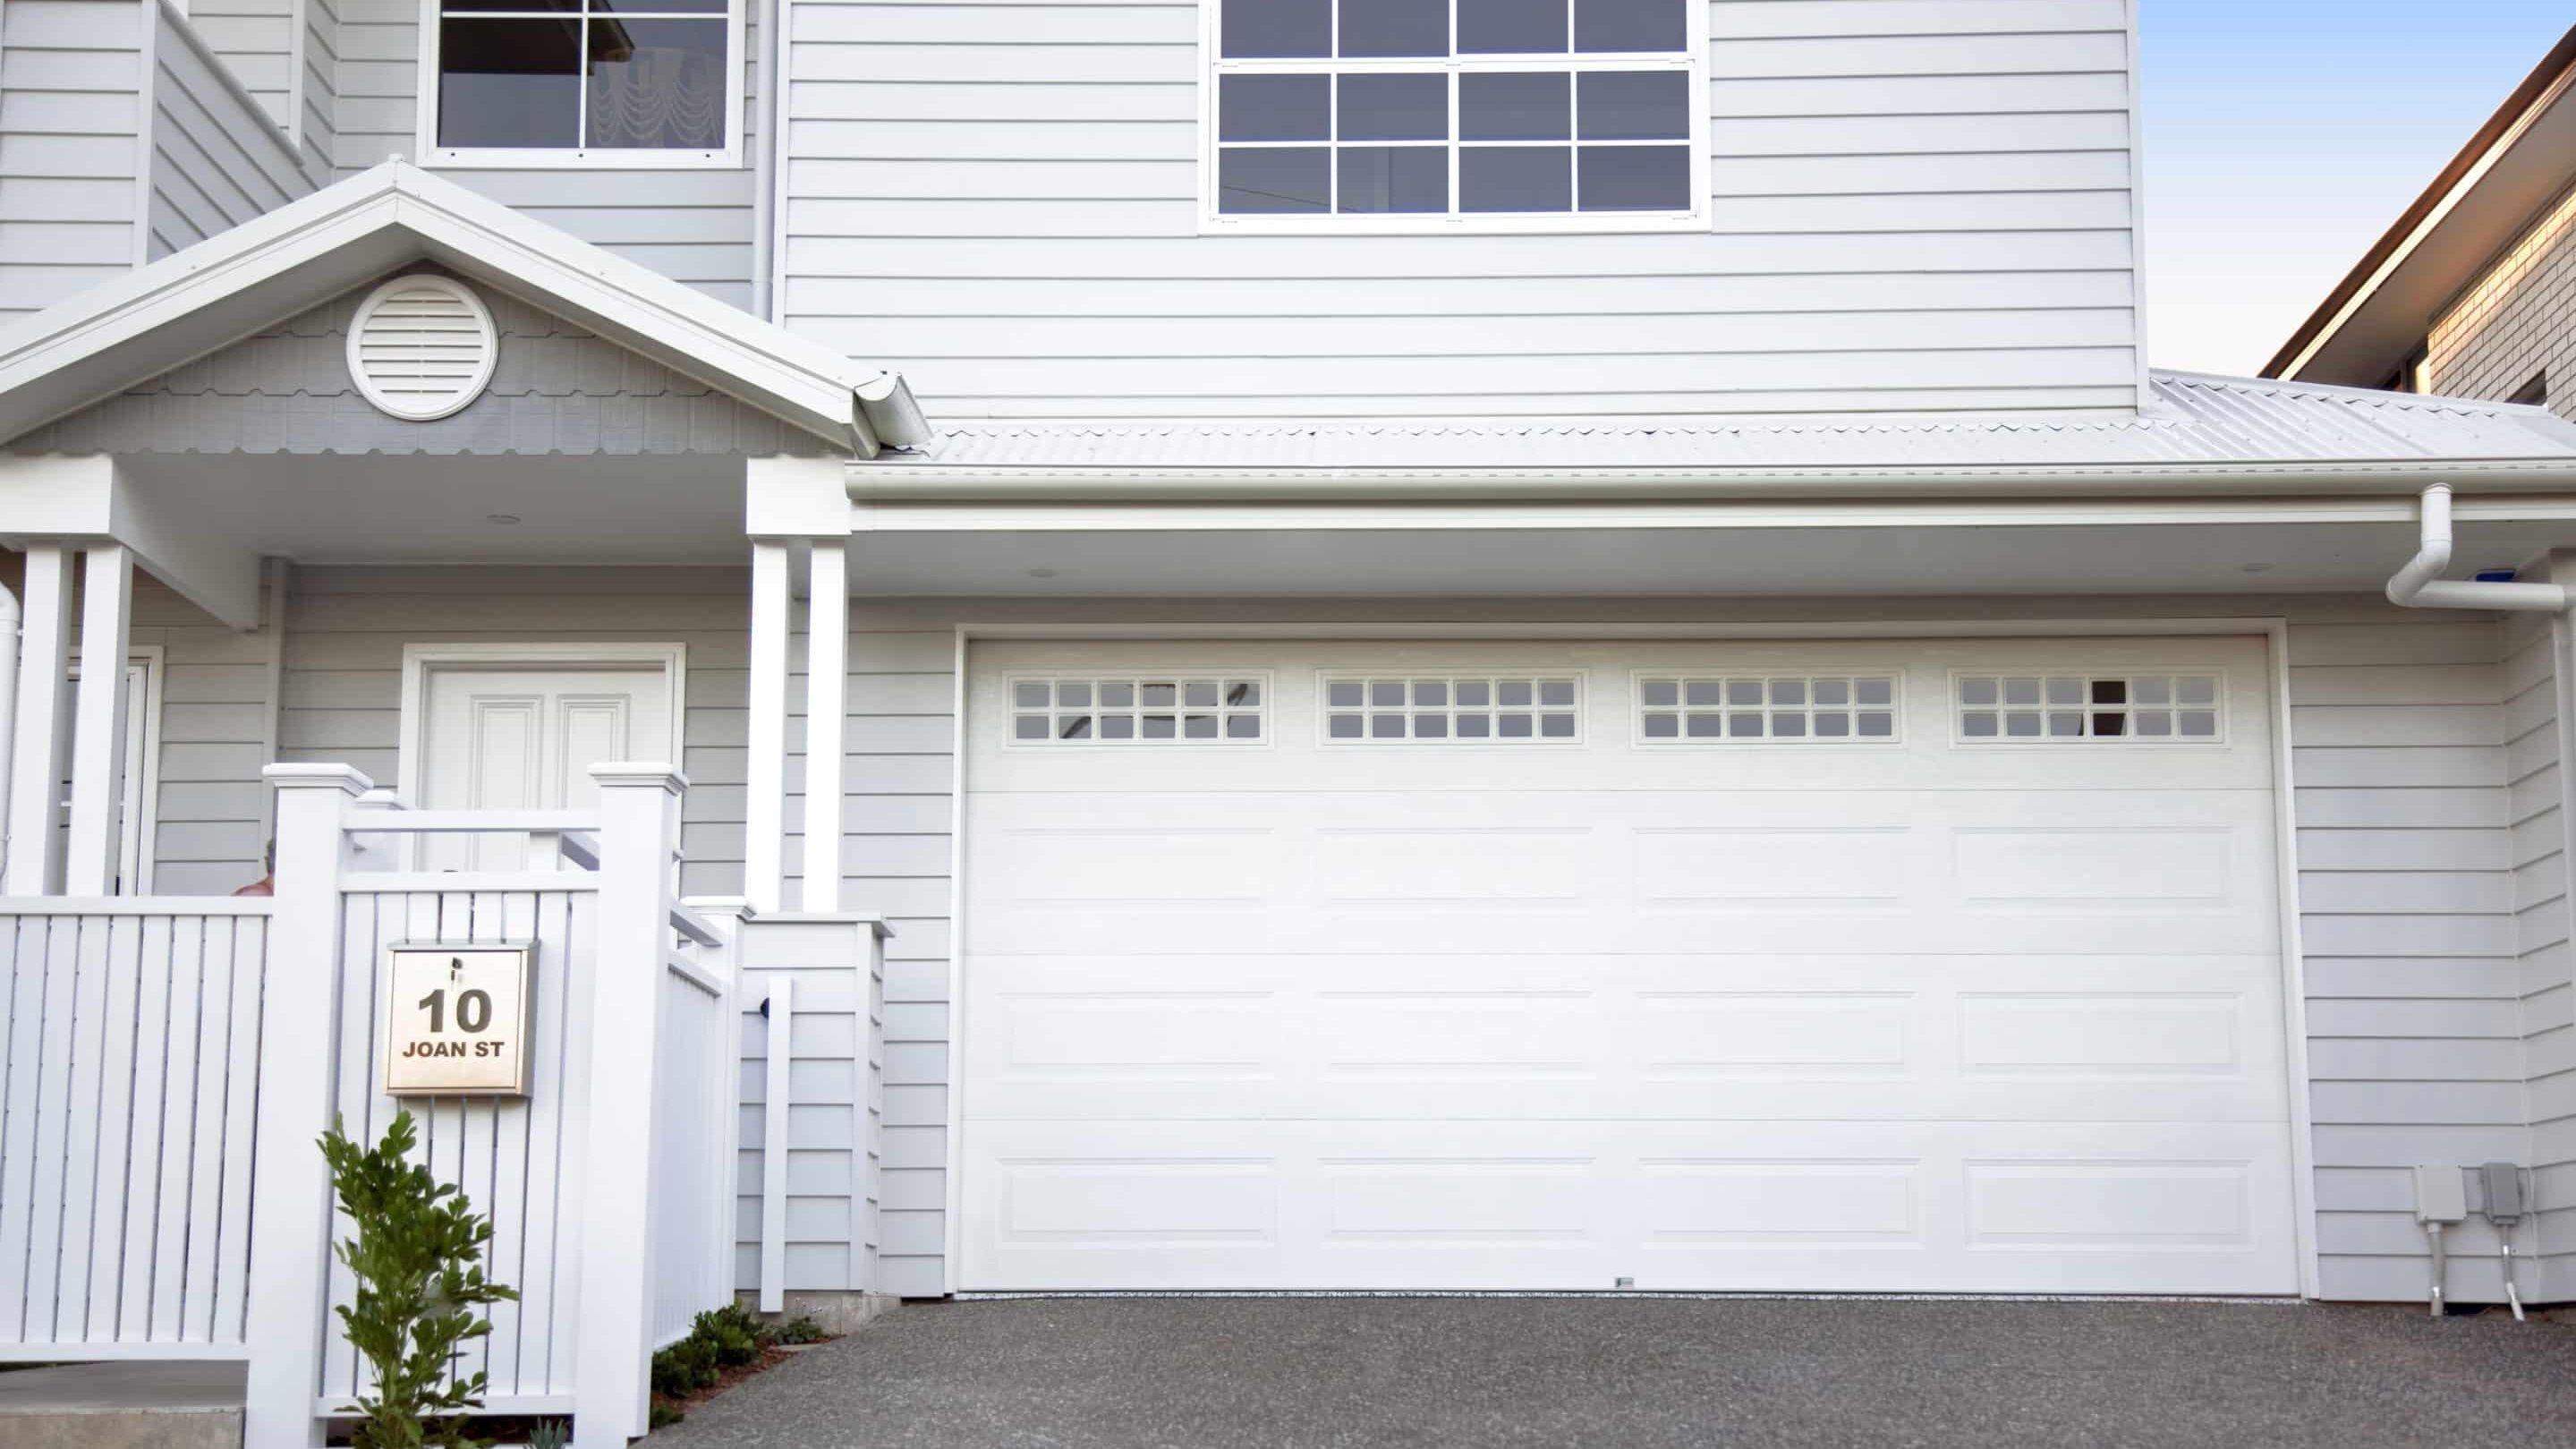 Centurion Hamptons White Garage Door on a Large House